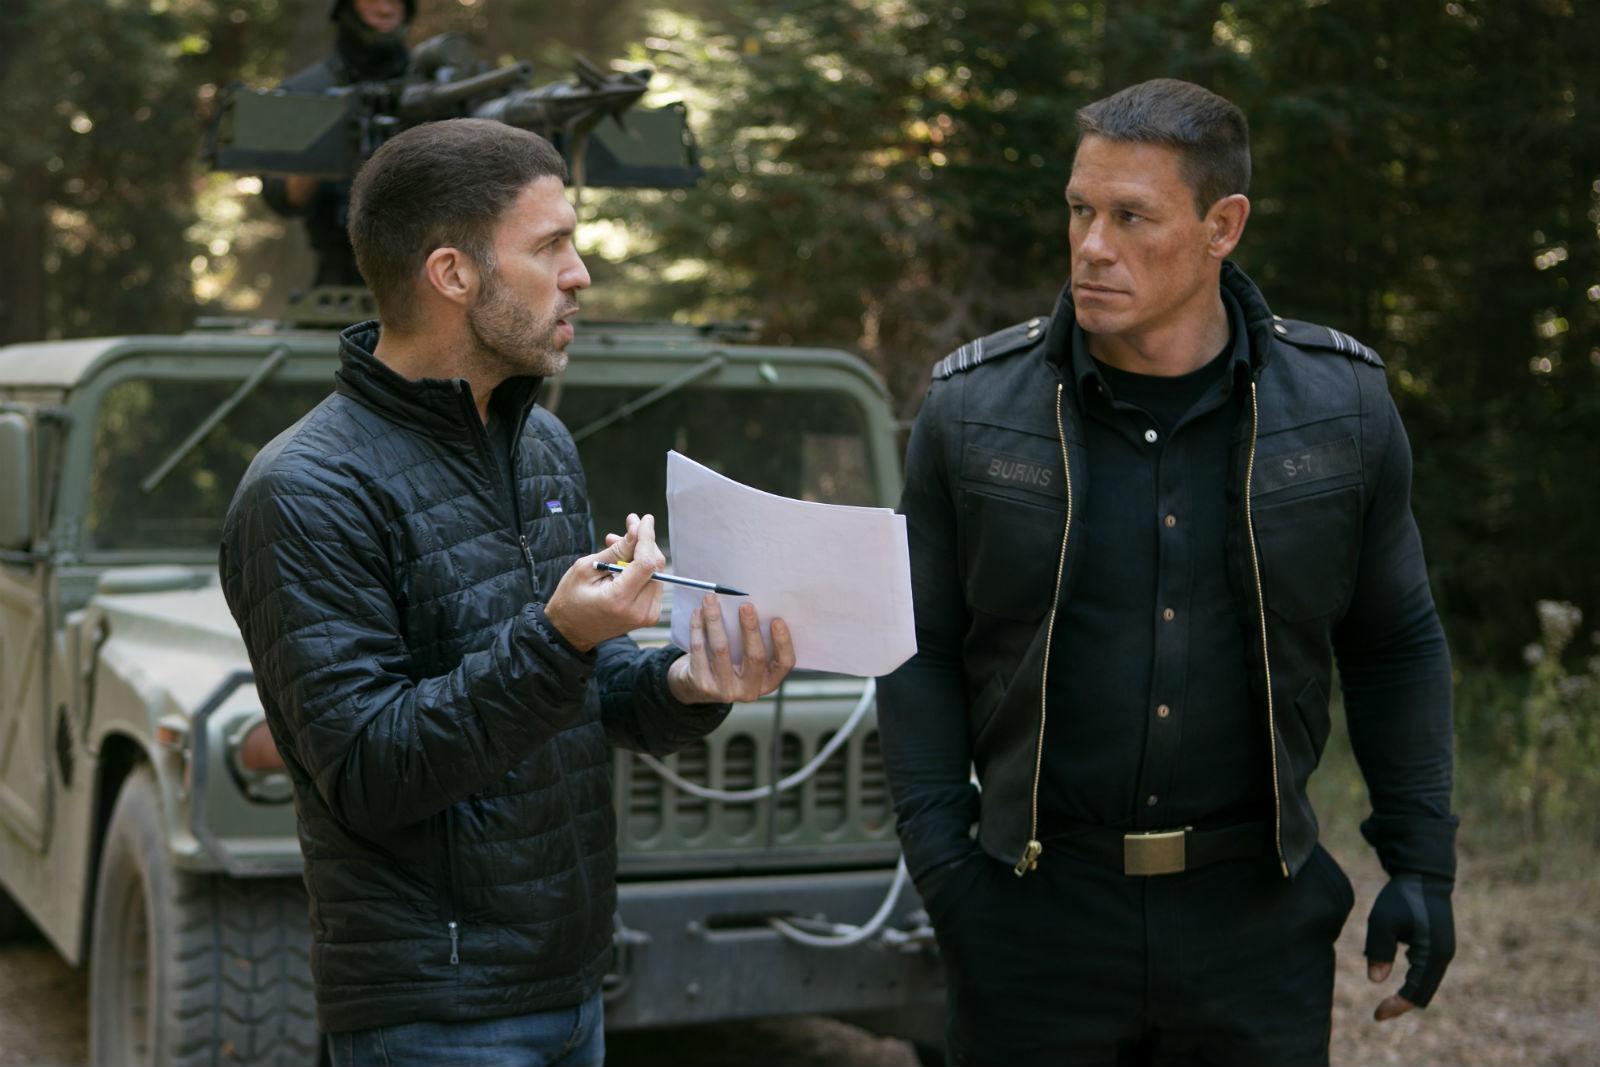 Director Travis Knight (left) with actor John Cena.